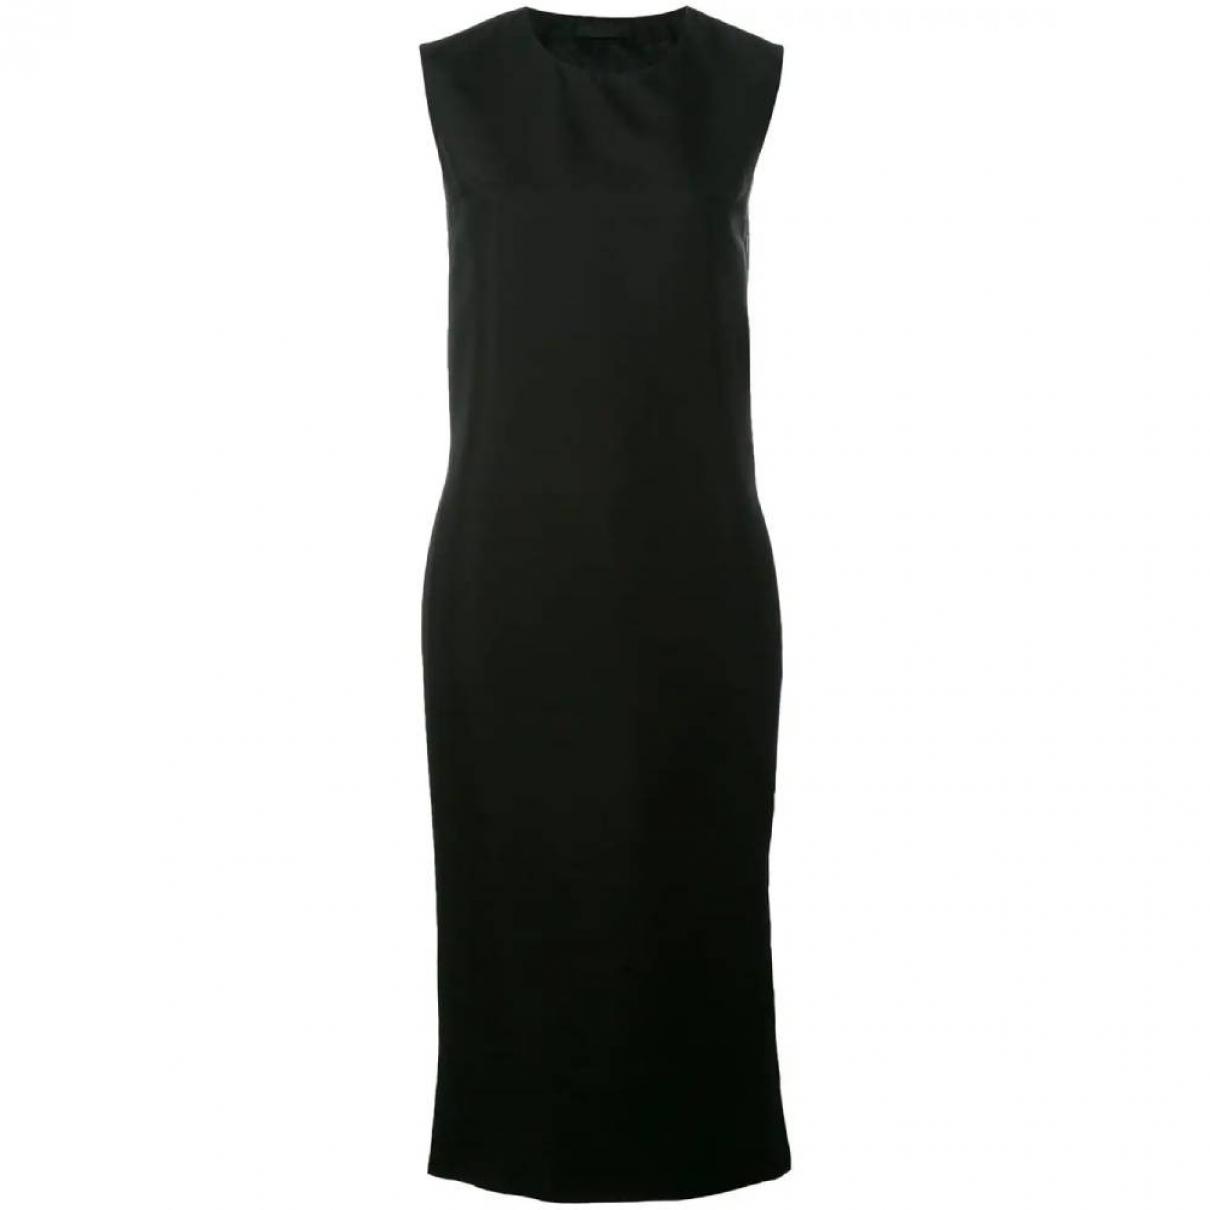 Prada \N Black Cotton dress for Women 42 IT